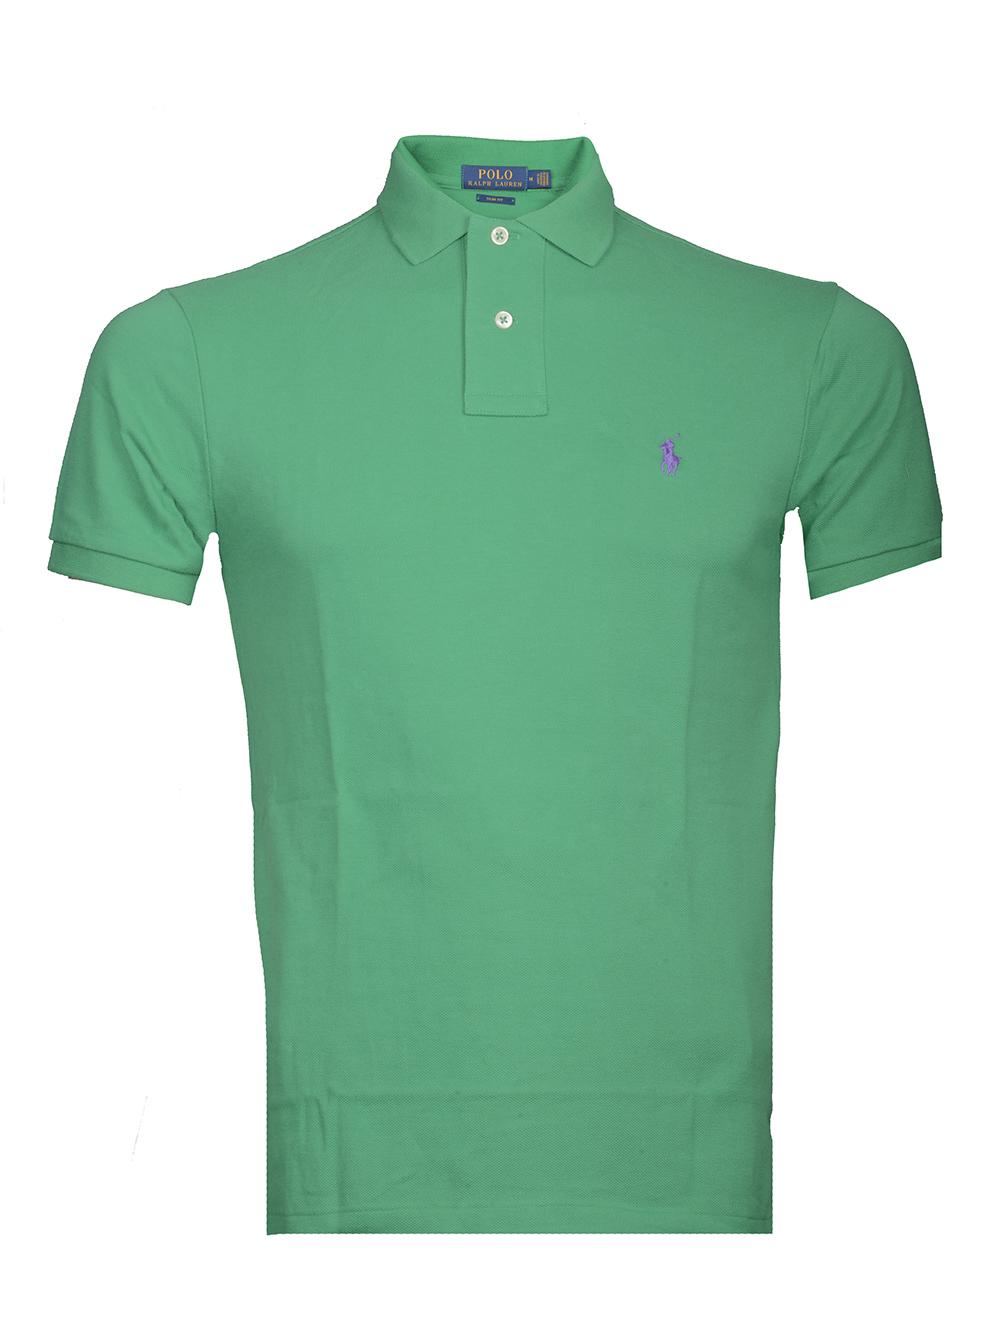 POLO RALPH LAUREN Μπλούζα Polo 710536856137 ΠΡΑΣΙΝΟ